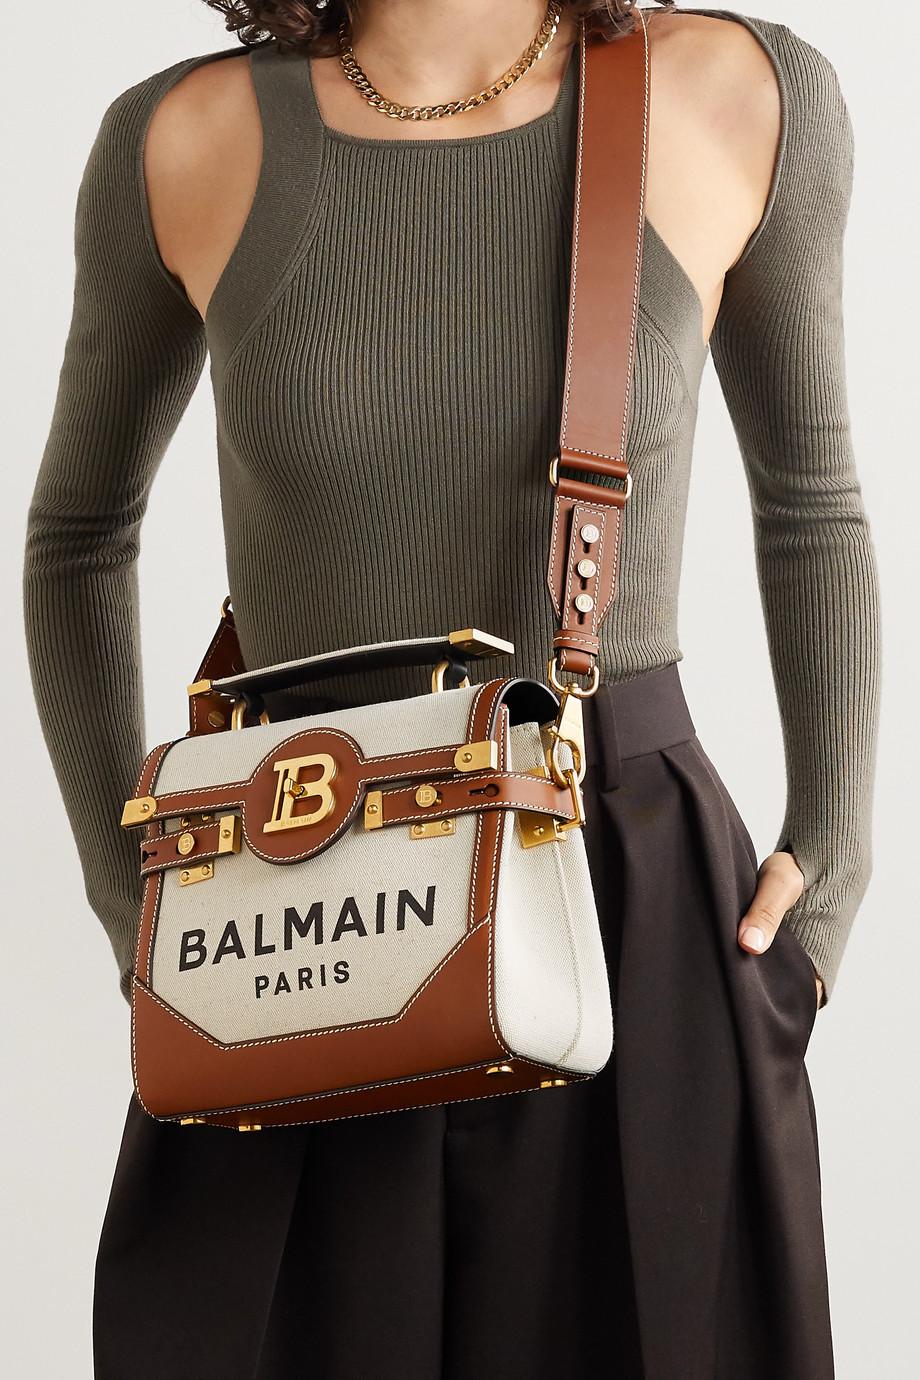 Balmain B-Buzz 23 Schultertasche aus bedrucktem Canvas mit Lederbesatz